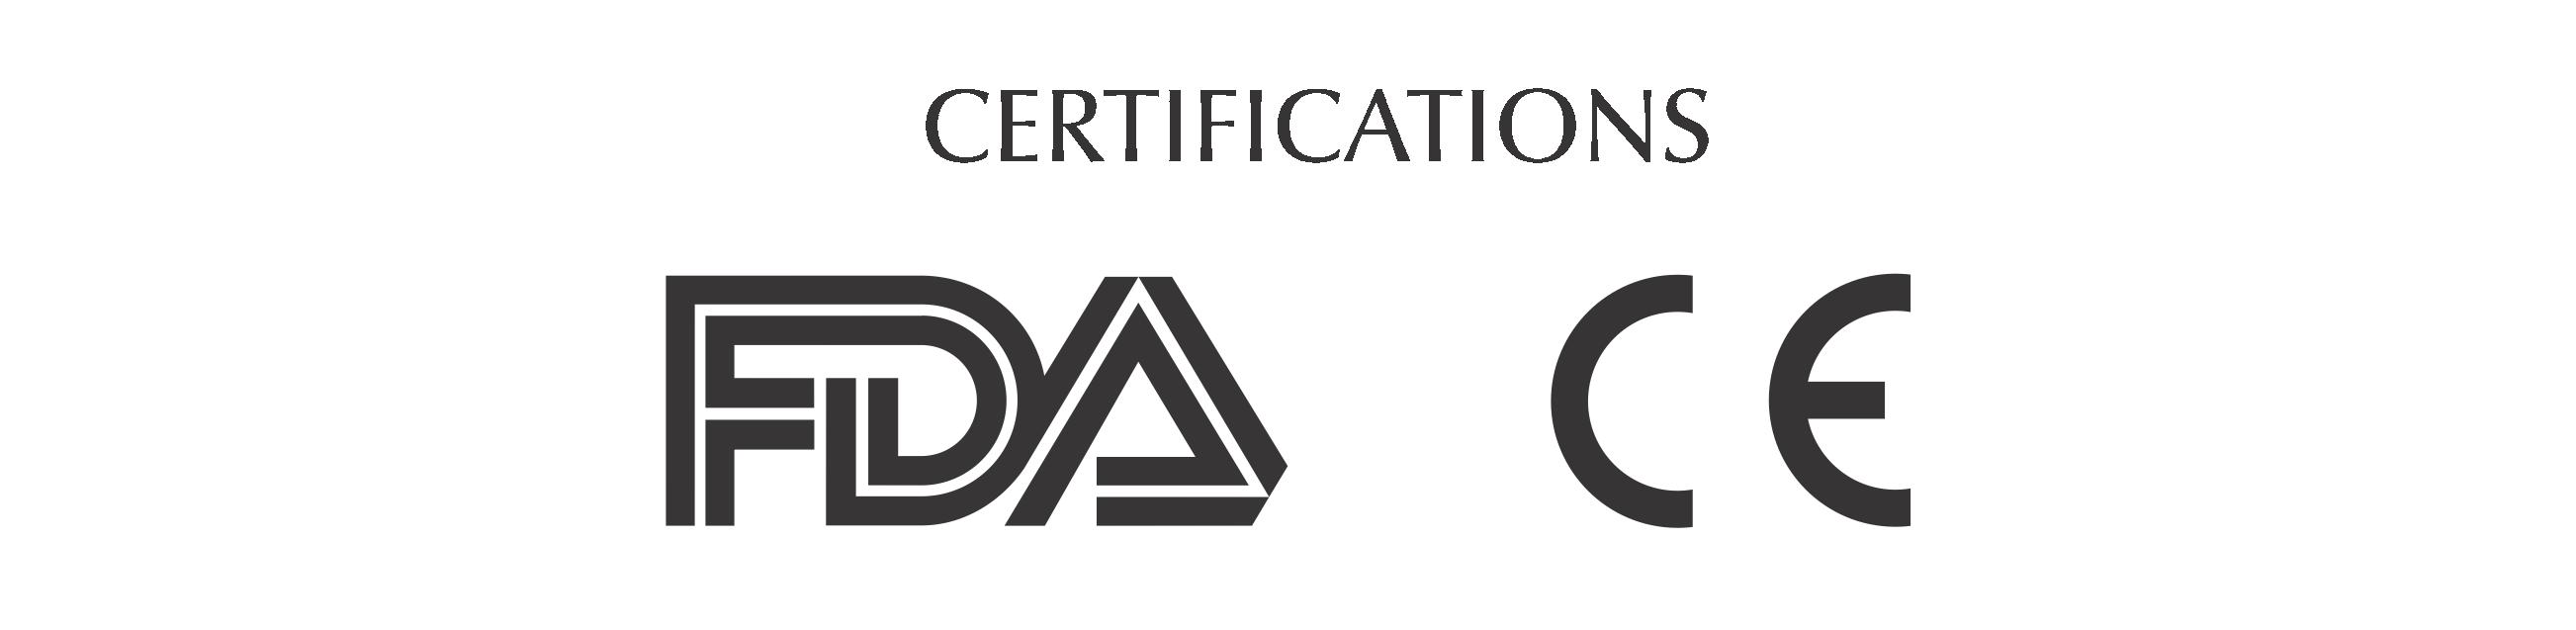 https://microdont.com.br/wp-content/uploads/2016/07/logo_cert_port_ing.png